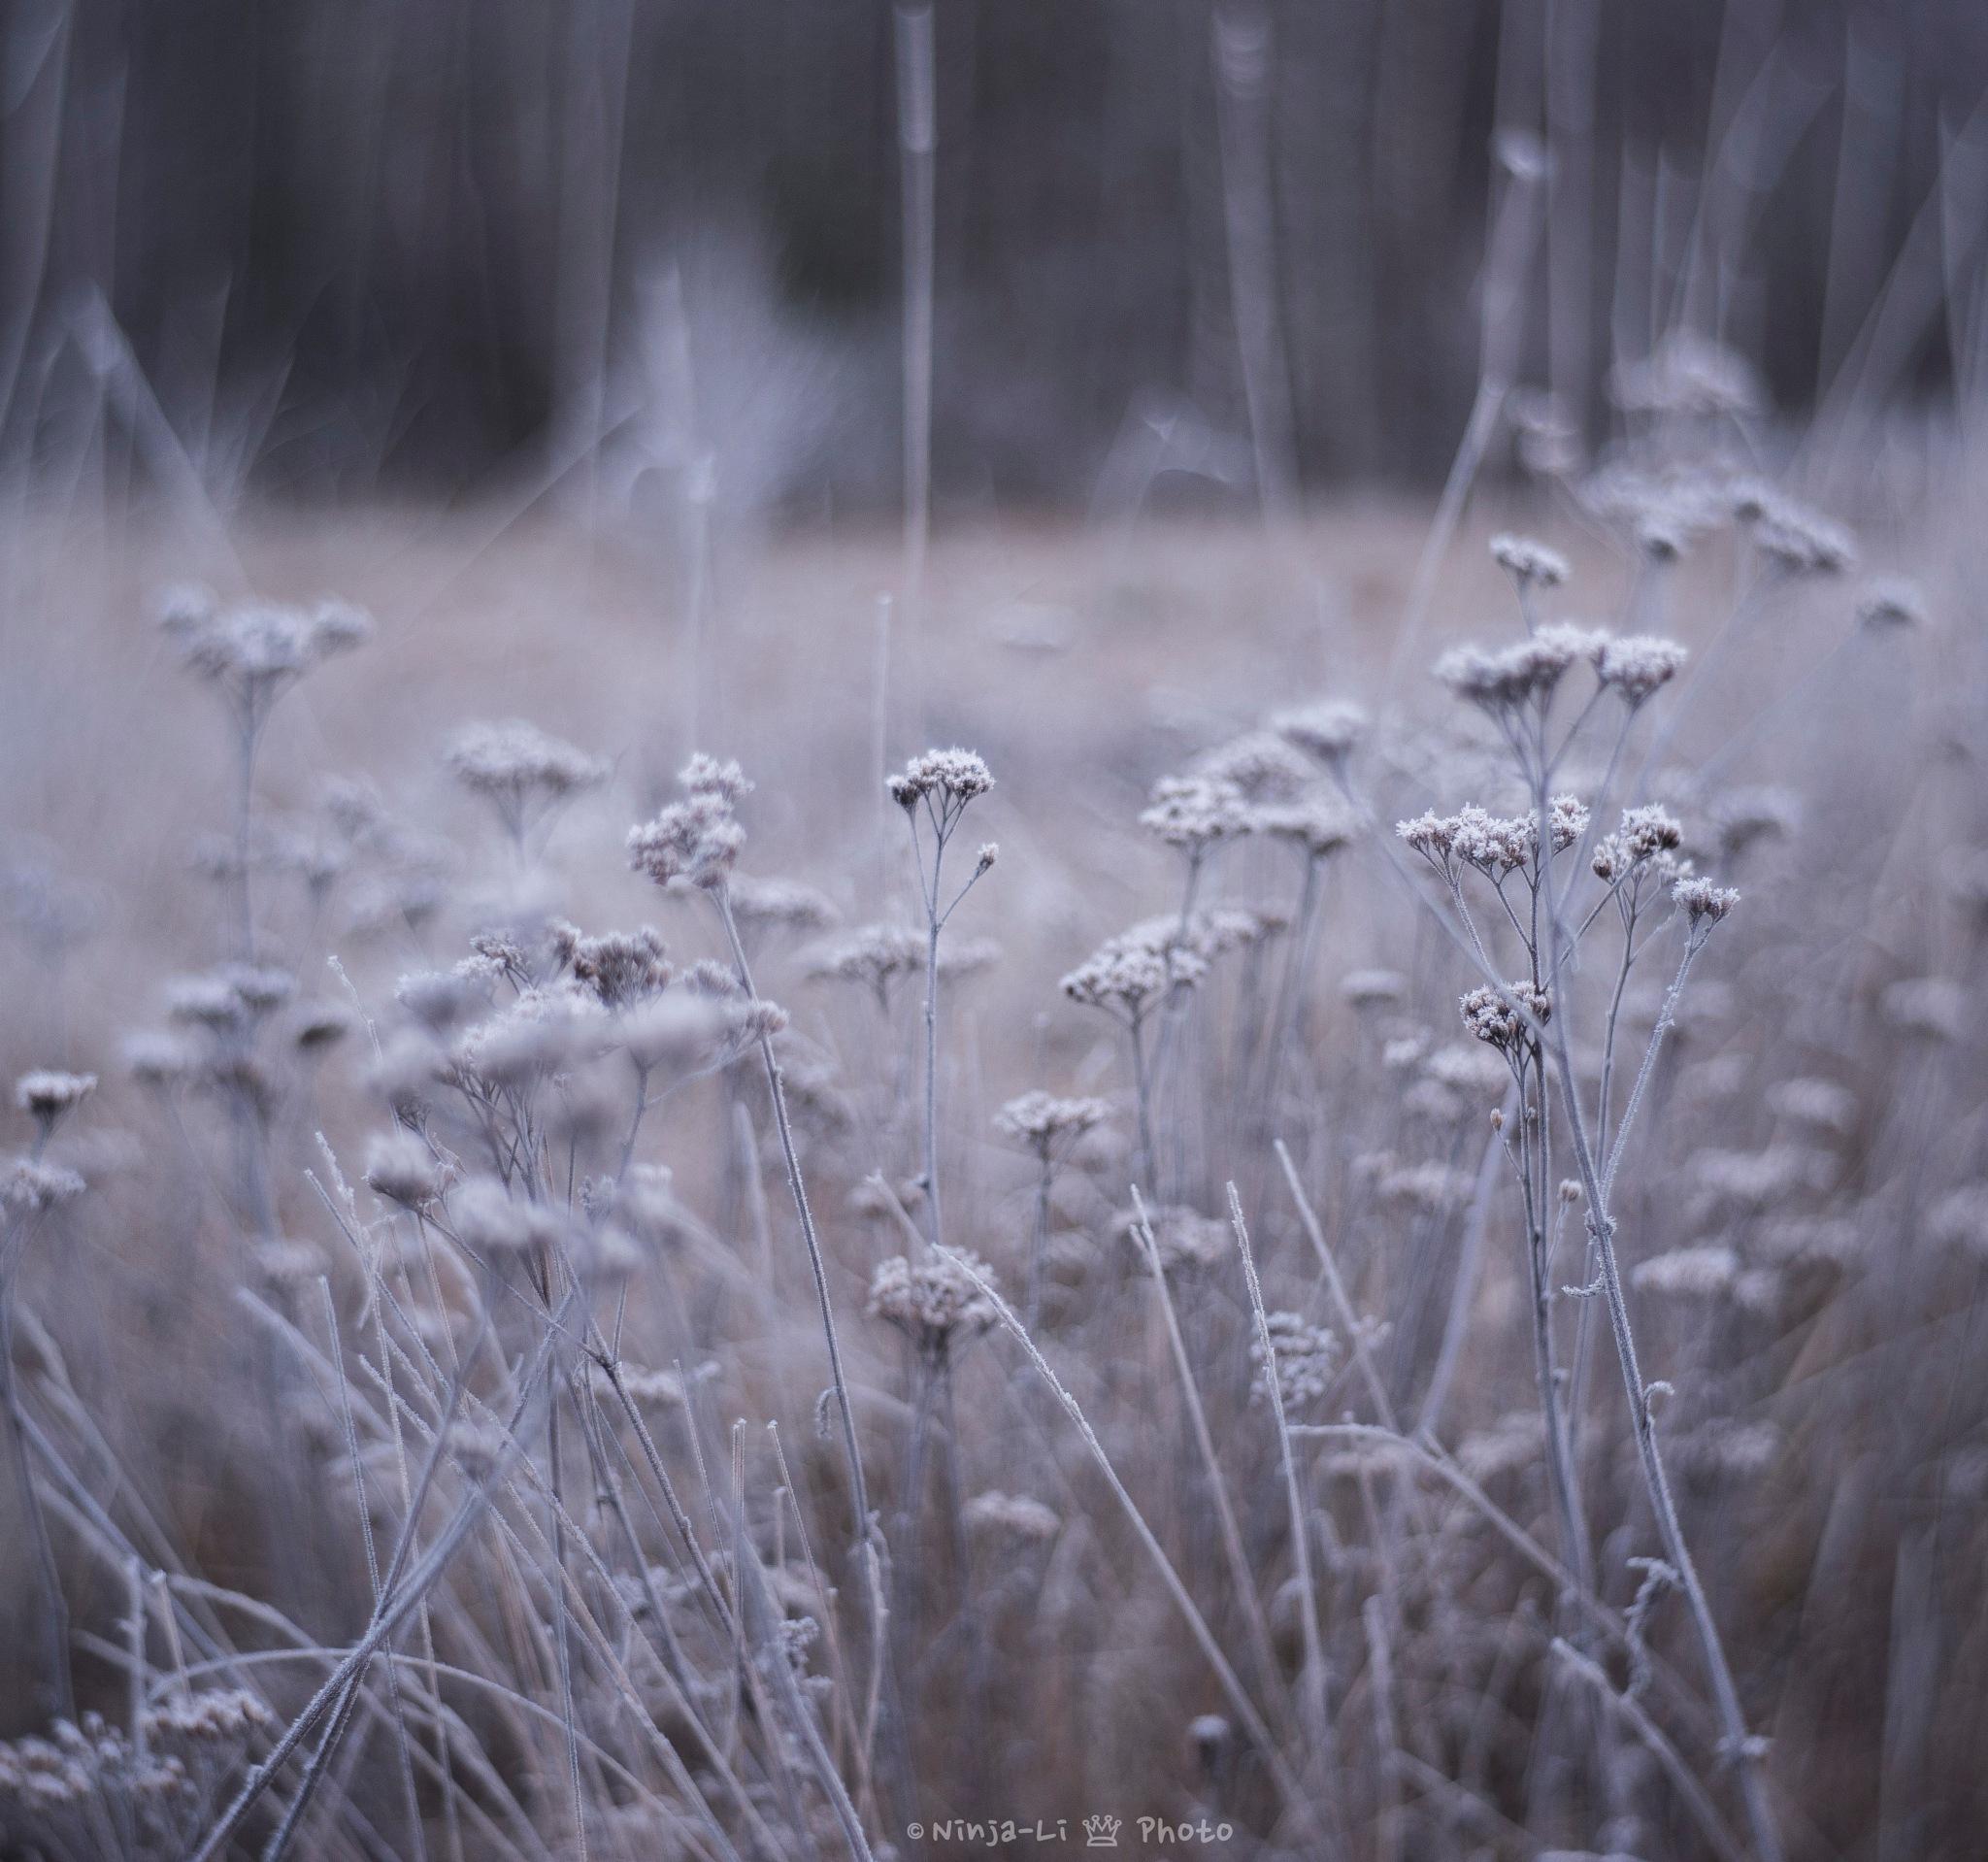 Winter meadow by ꪀⅈꪀ𝕛ꪖ-ꪶⅈ ꫀⅈꪀꪖ𝕣ડꫀꪀ ડ𝕥ꪖꫝ𝕣ꫀ